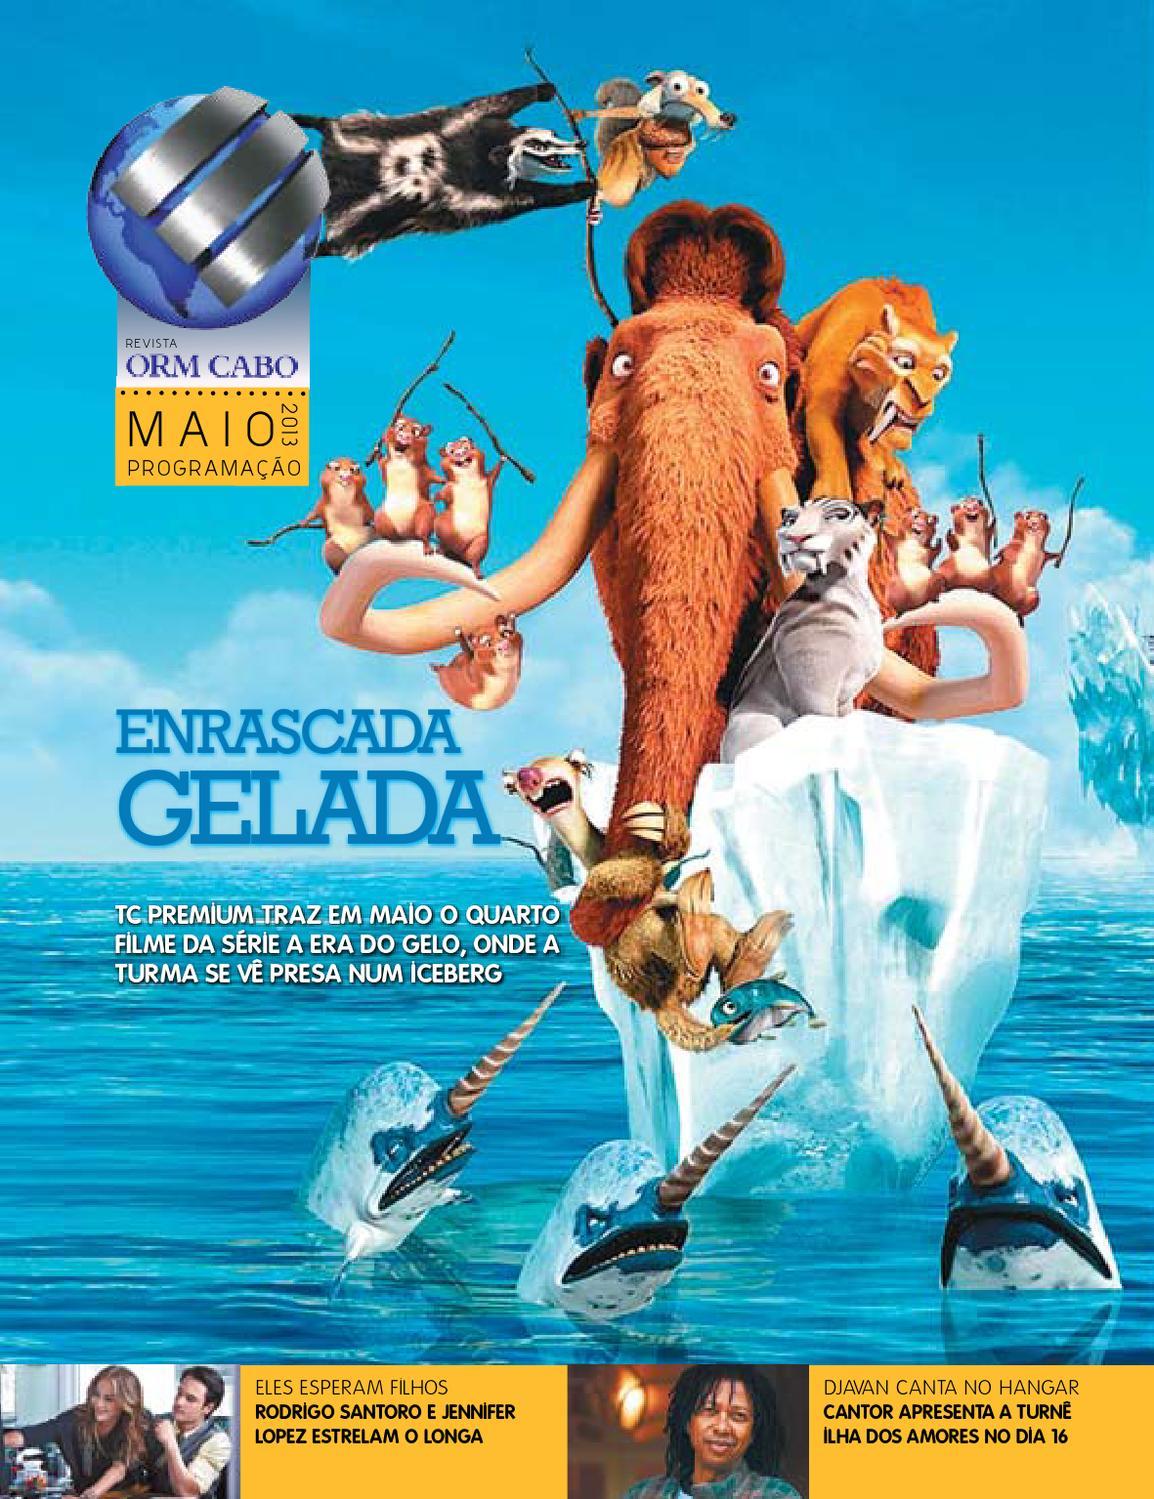 Revista Ormcabo Maio 2013 By Edgar Silva Issuu